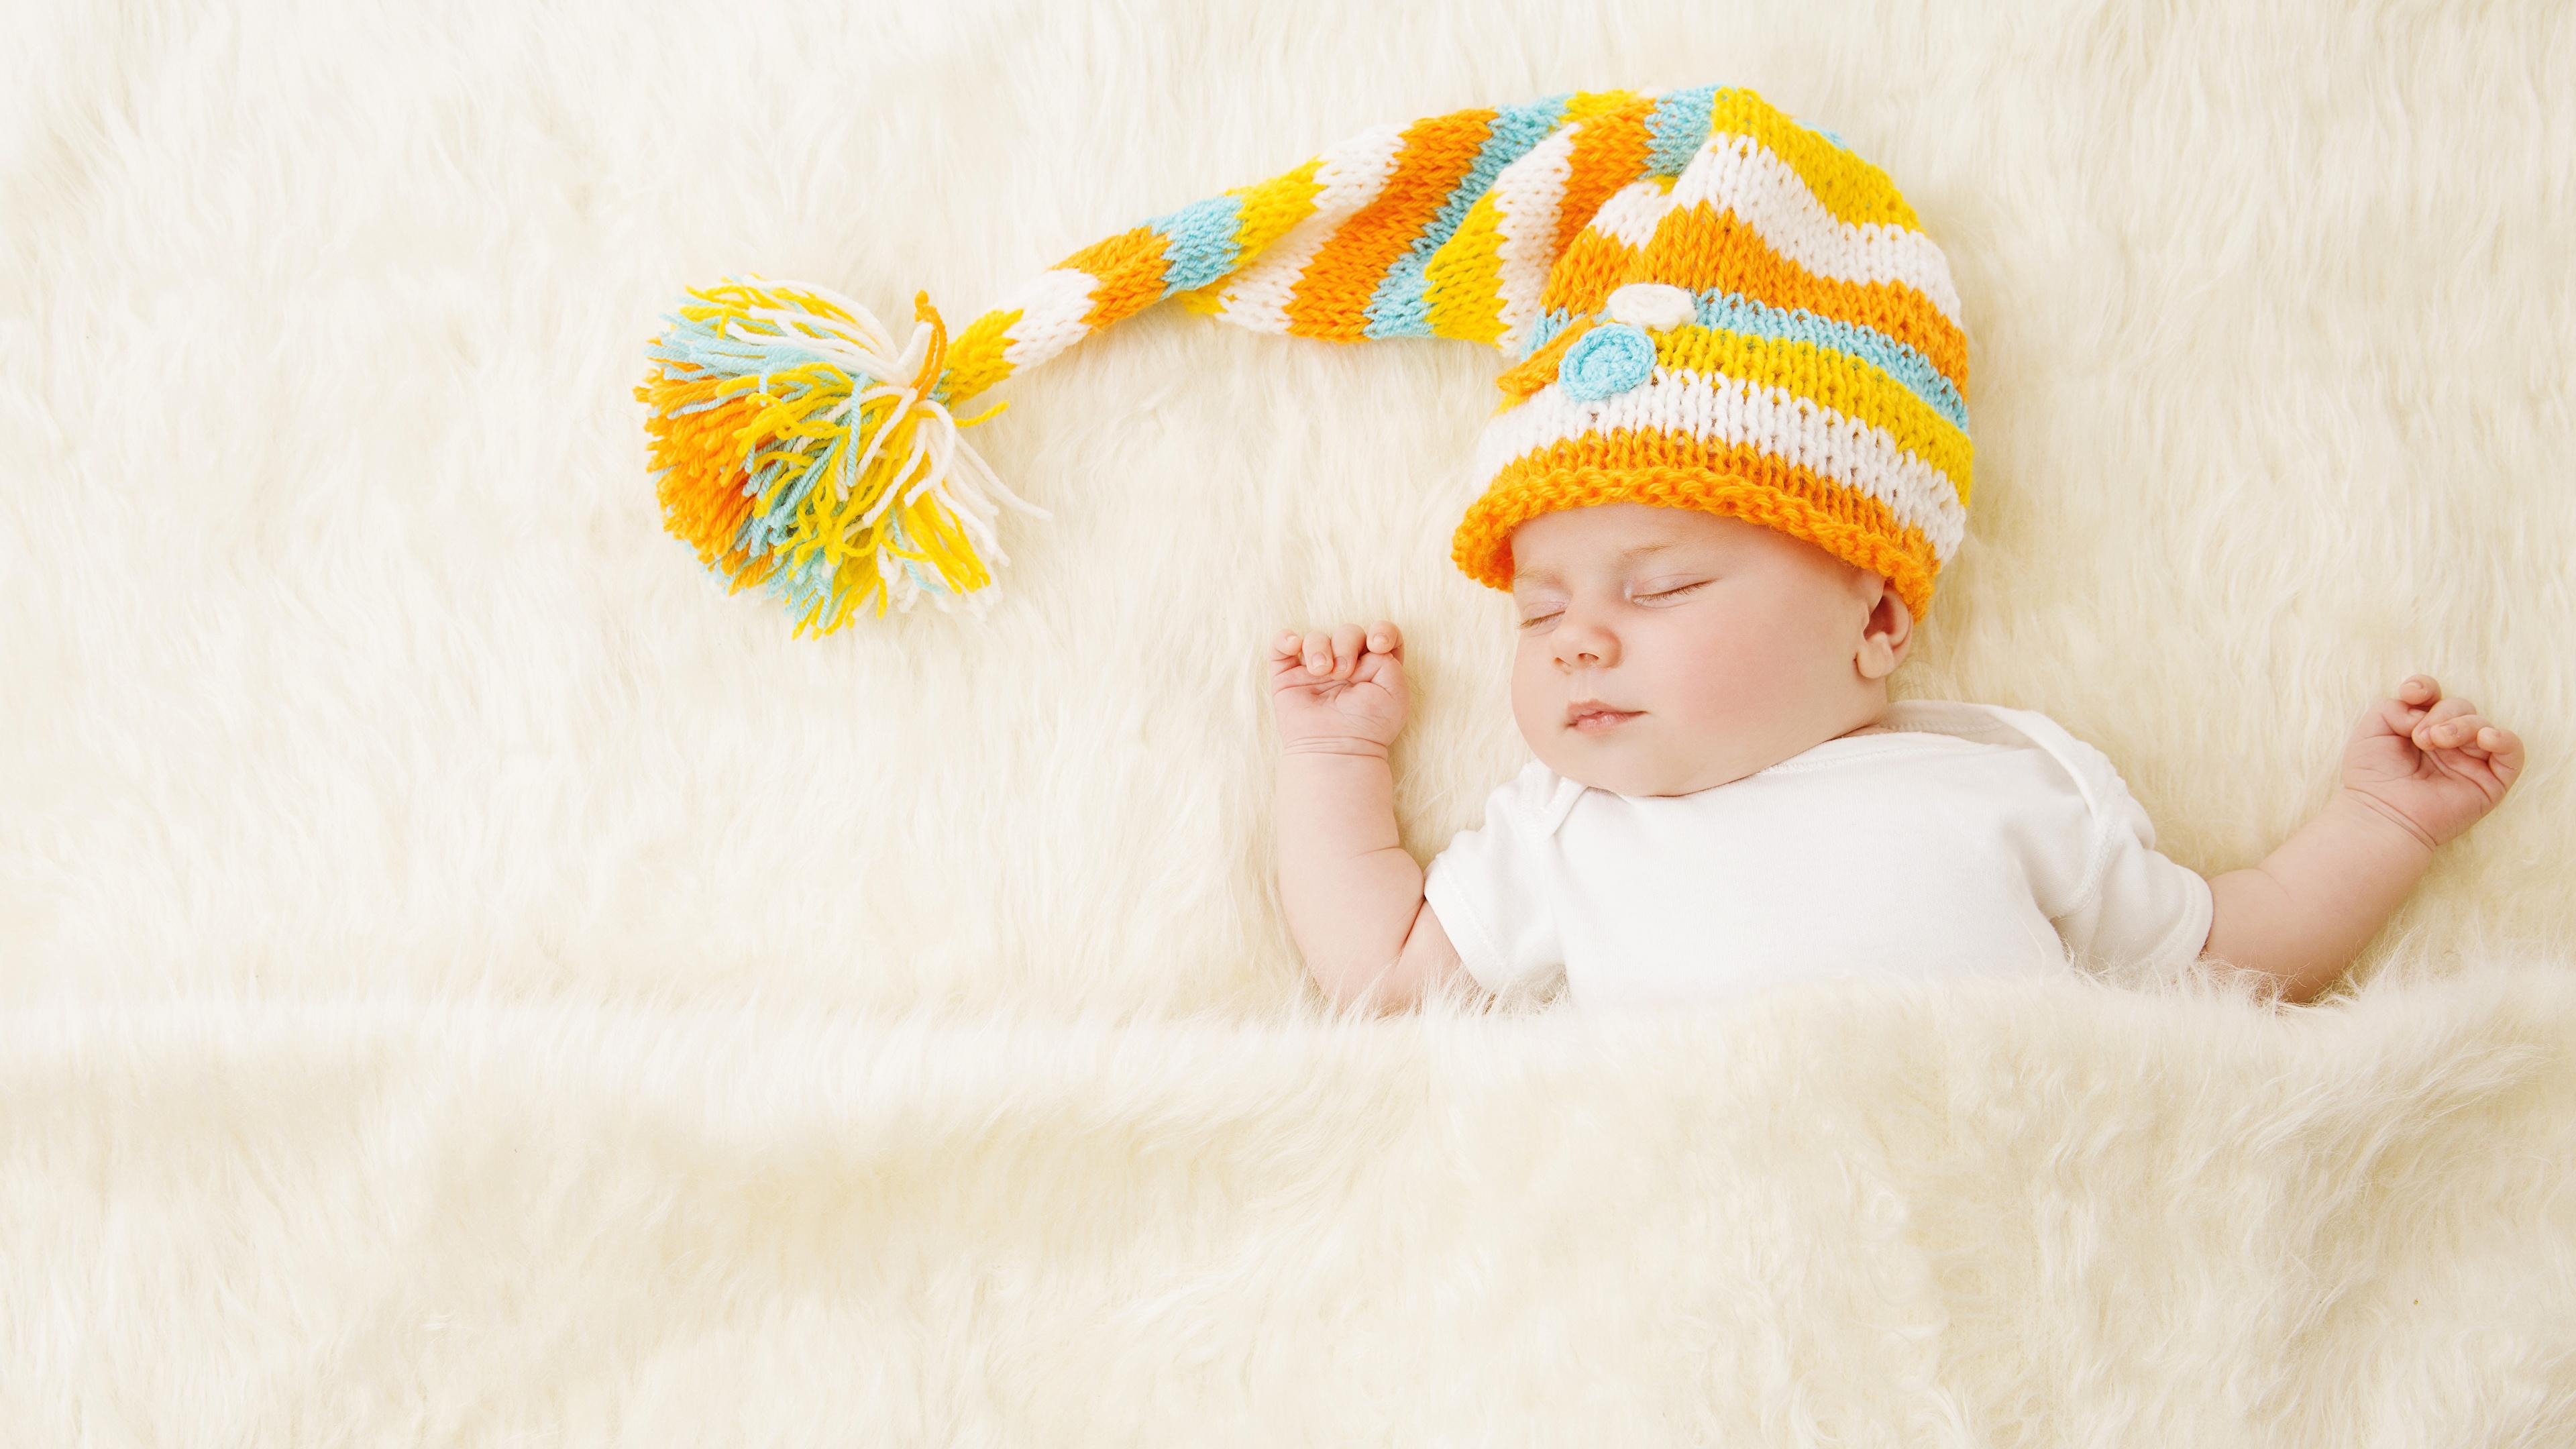 Картинка грудной ребёнок ребёнок Спит шапка 3840x2160 младенца младенец Младенцы Дети сон спят Шапки спящий в шапке